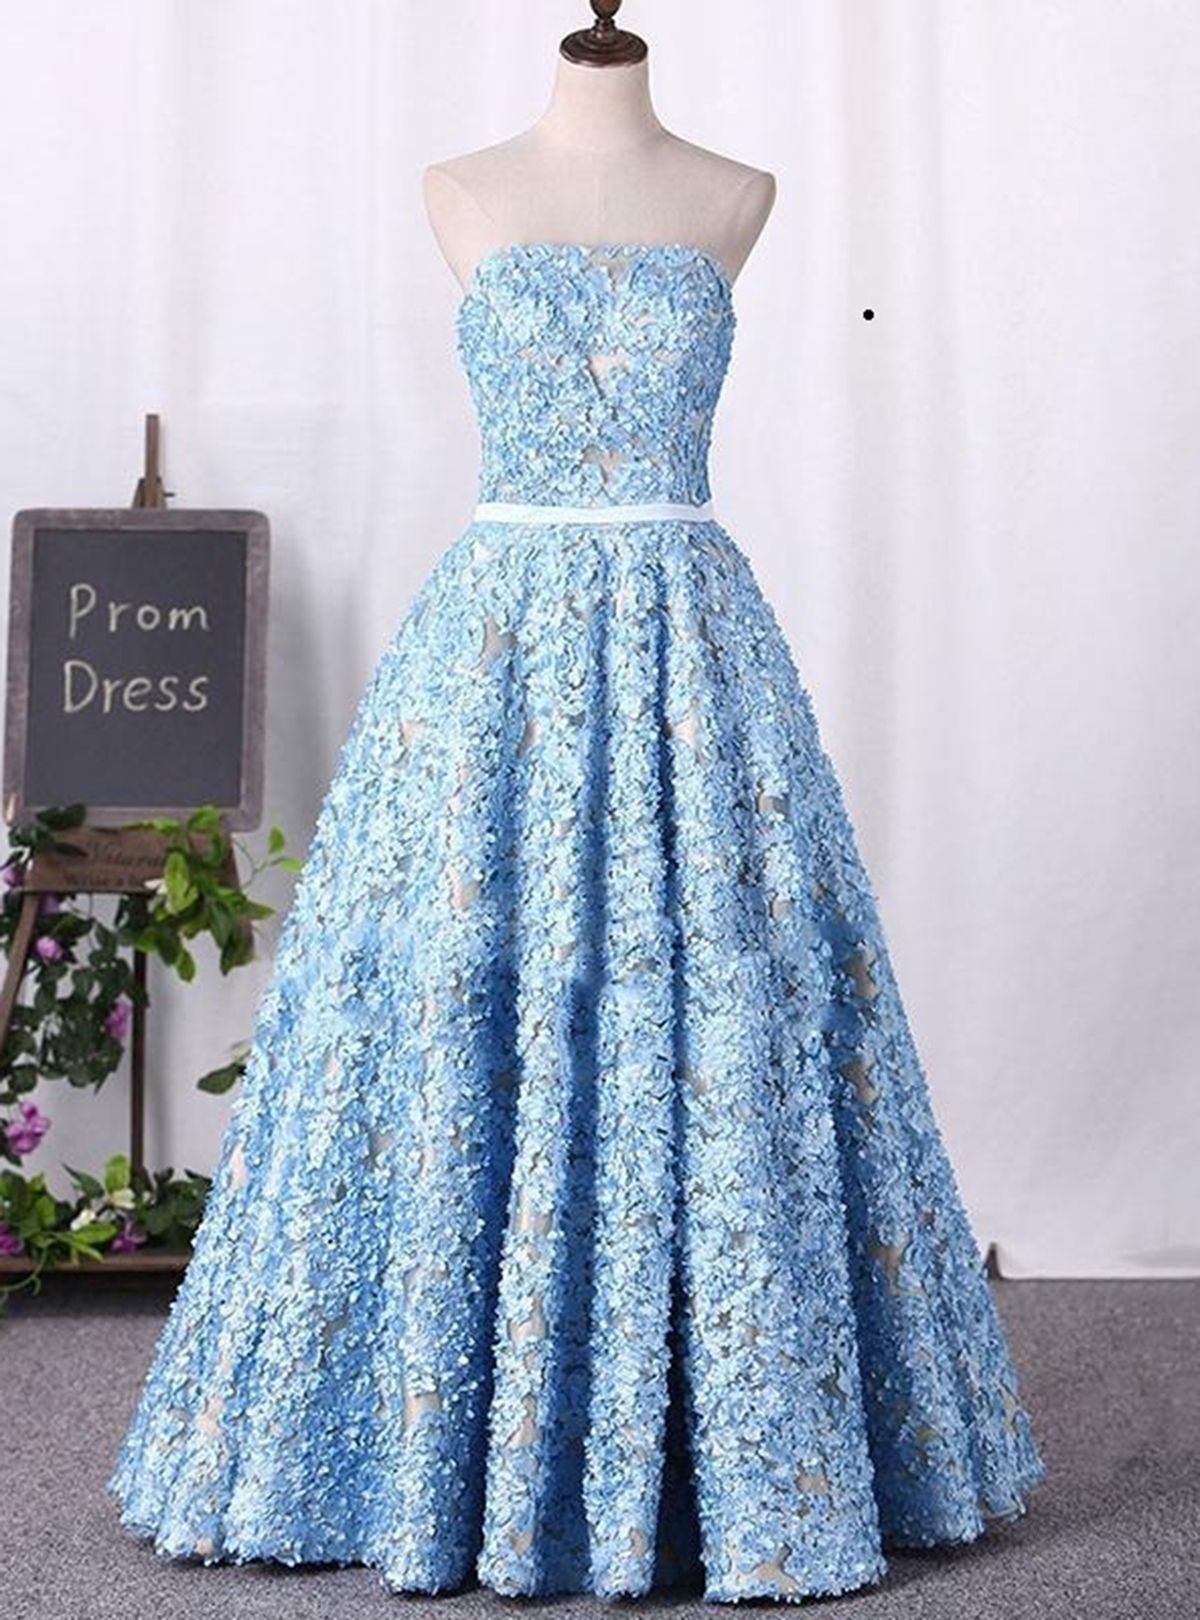 Sweetheart neck blue lace long formal prom dress long evening dress